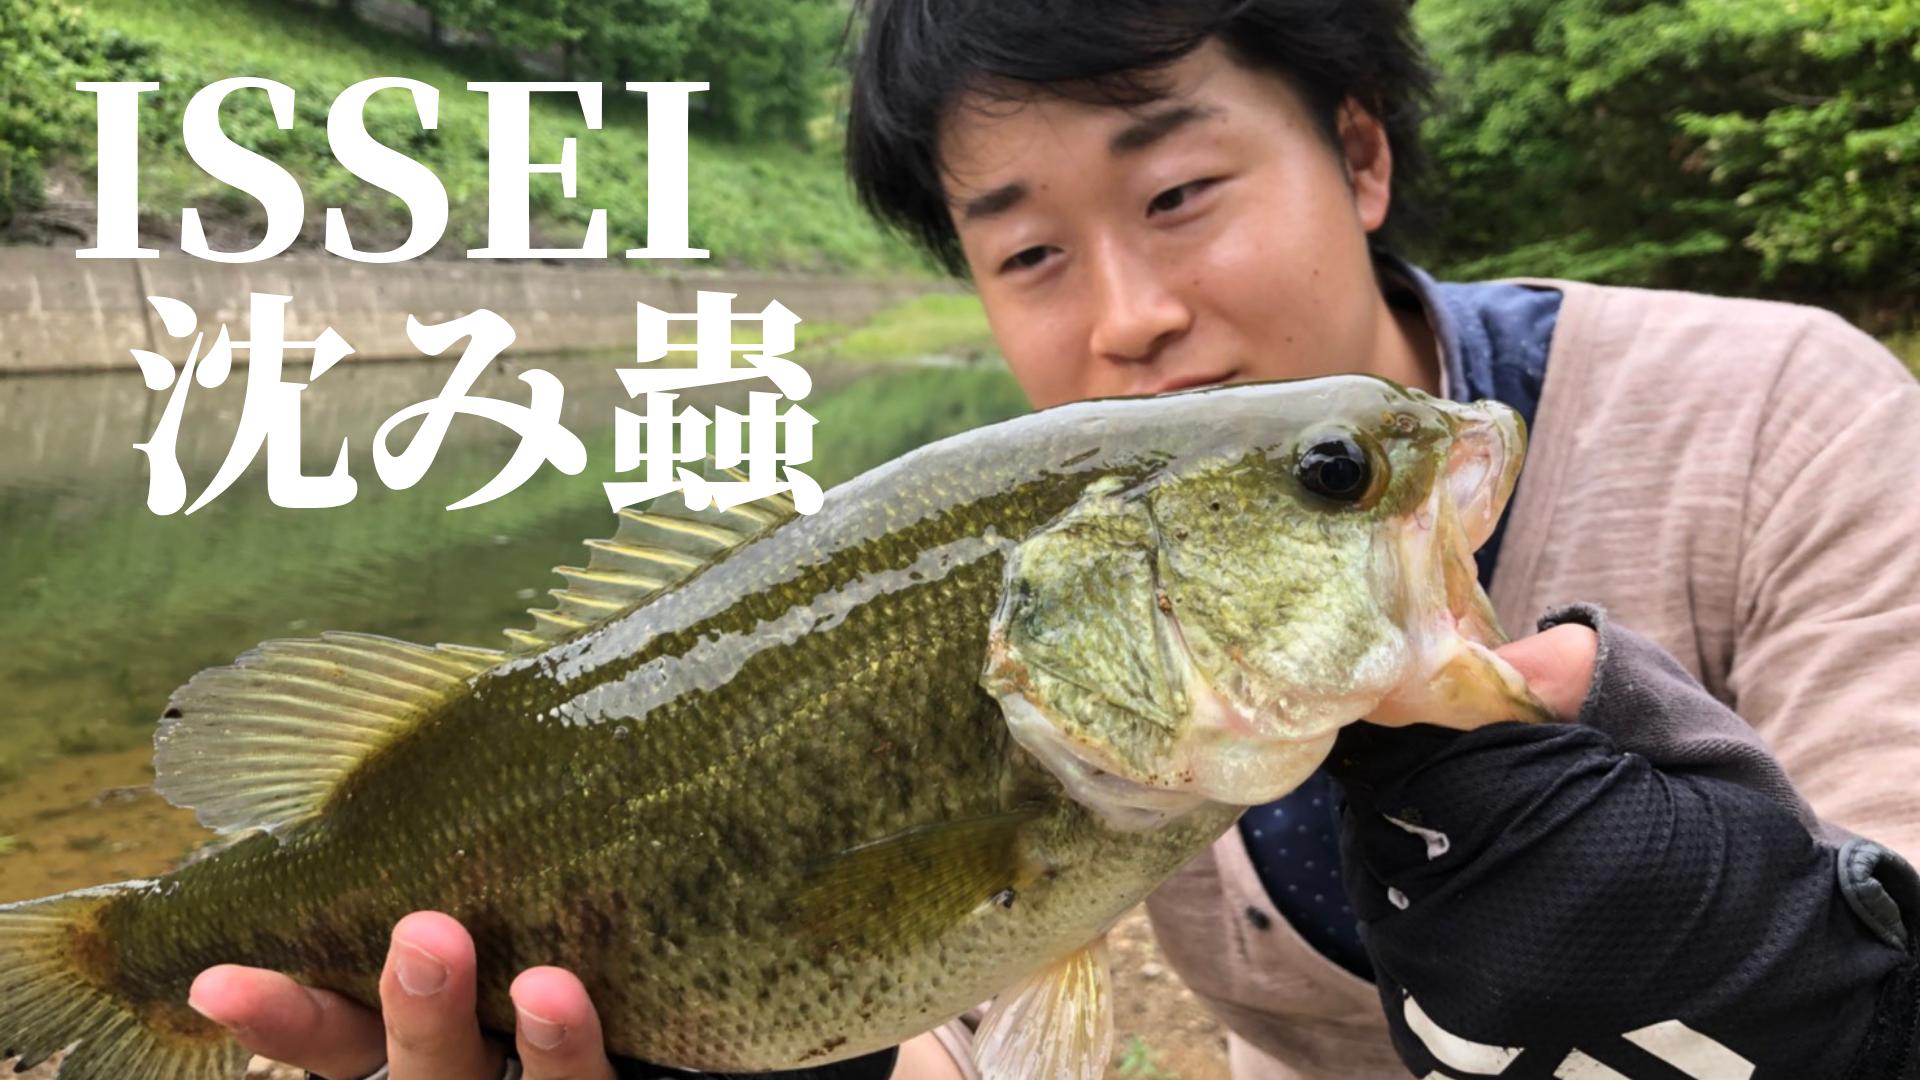 issei沈み蟲の釣れるバックスライドを体感せよ!使い方とセッティングをご紹介!